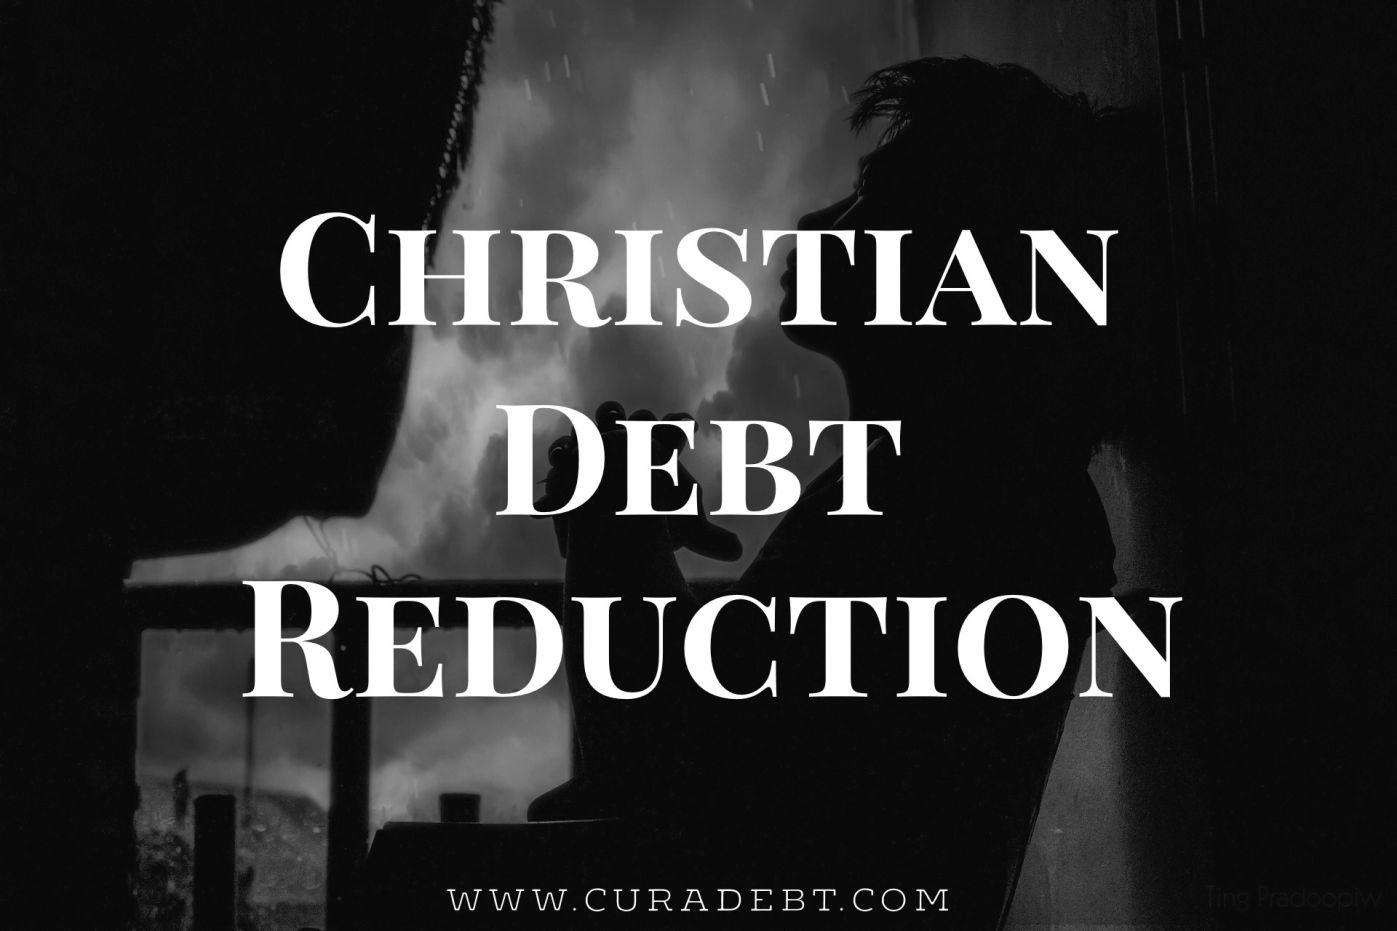 CuraDebt Discusses Christian Debt Reduction